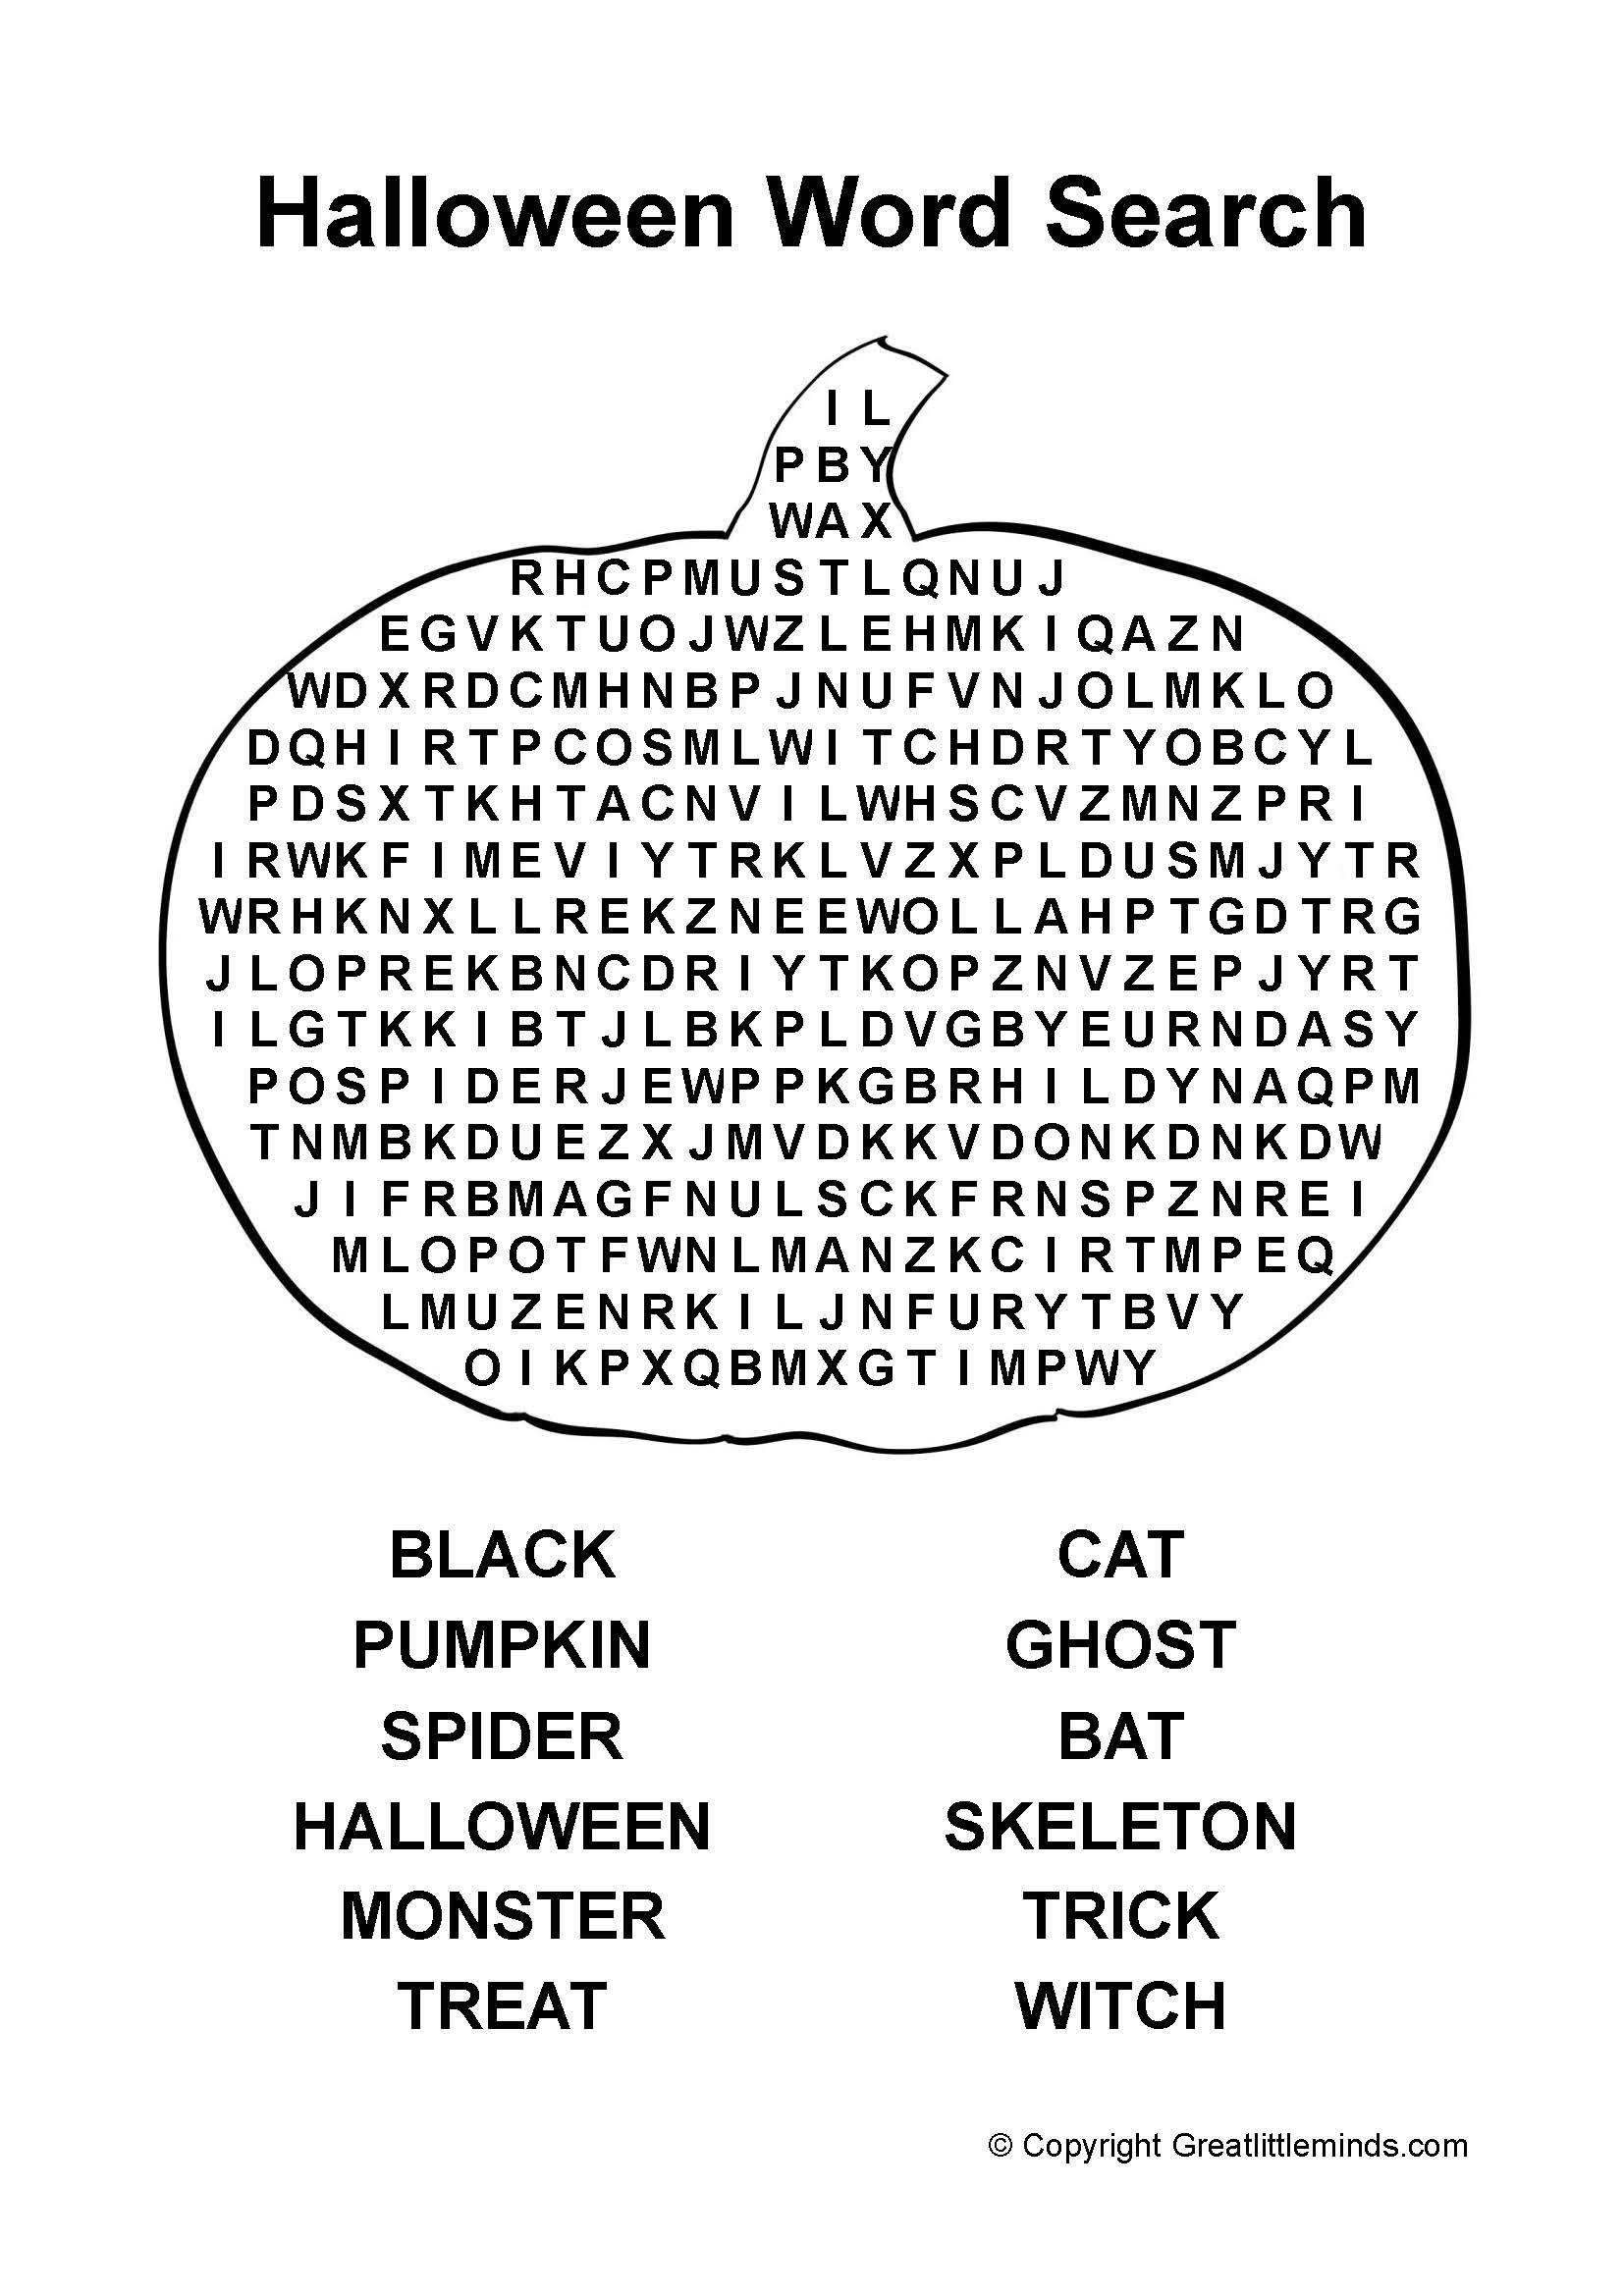 Halloween Word Search Pdf | Halloween Word Search, Halloween